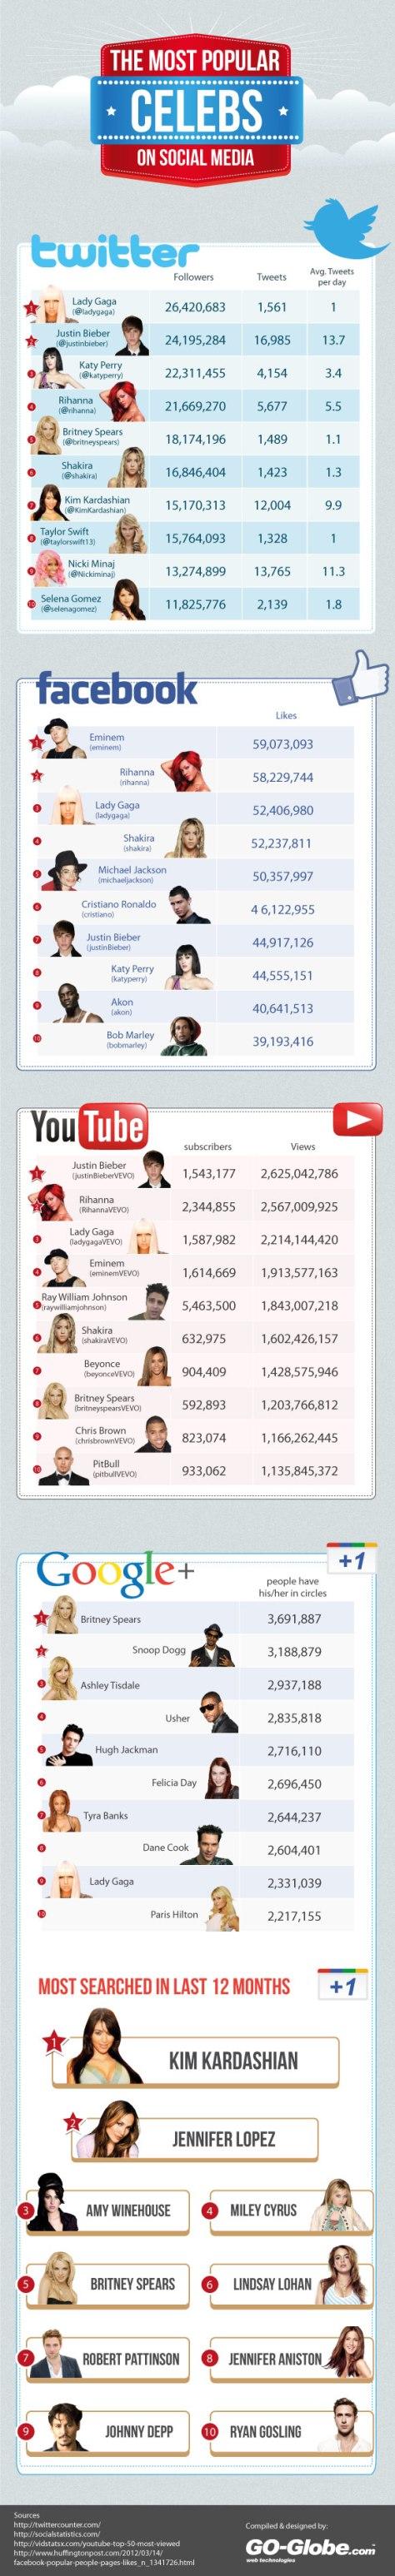 The Most Popular Celebs on Social Media